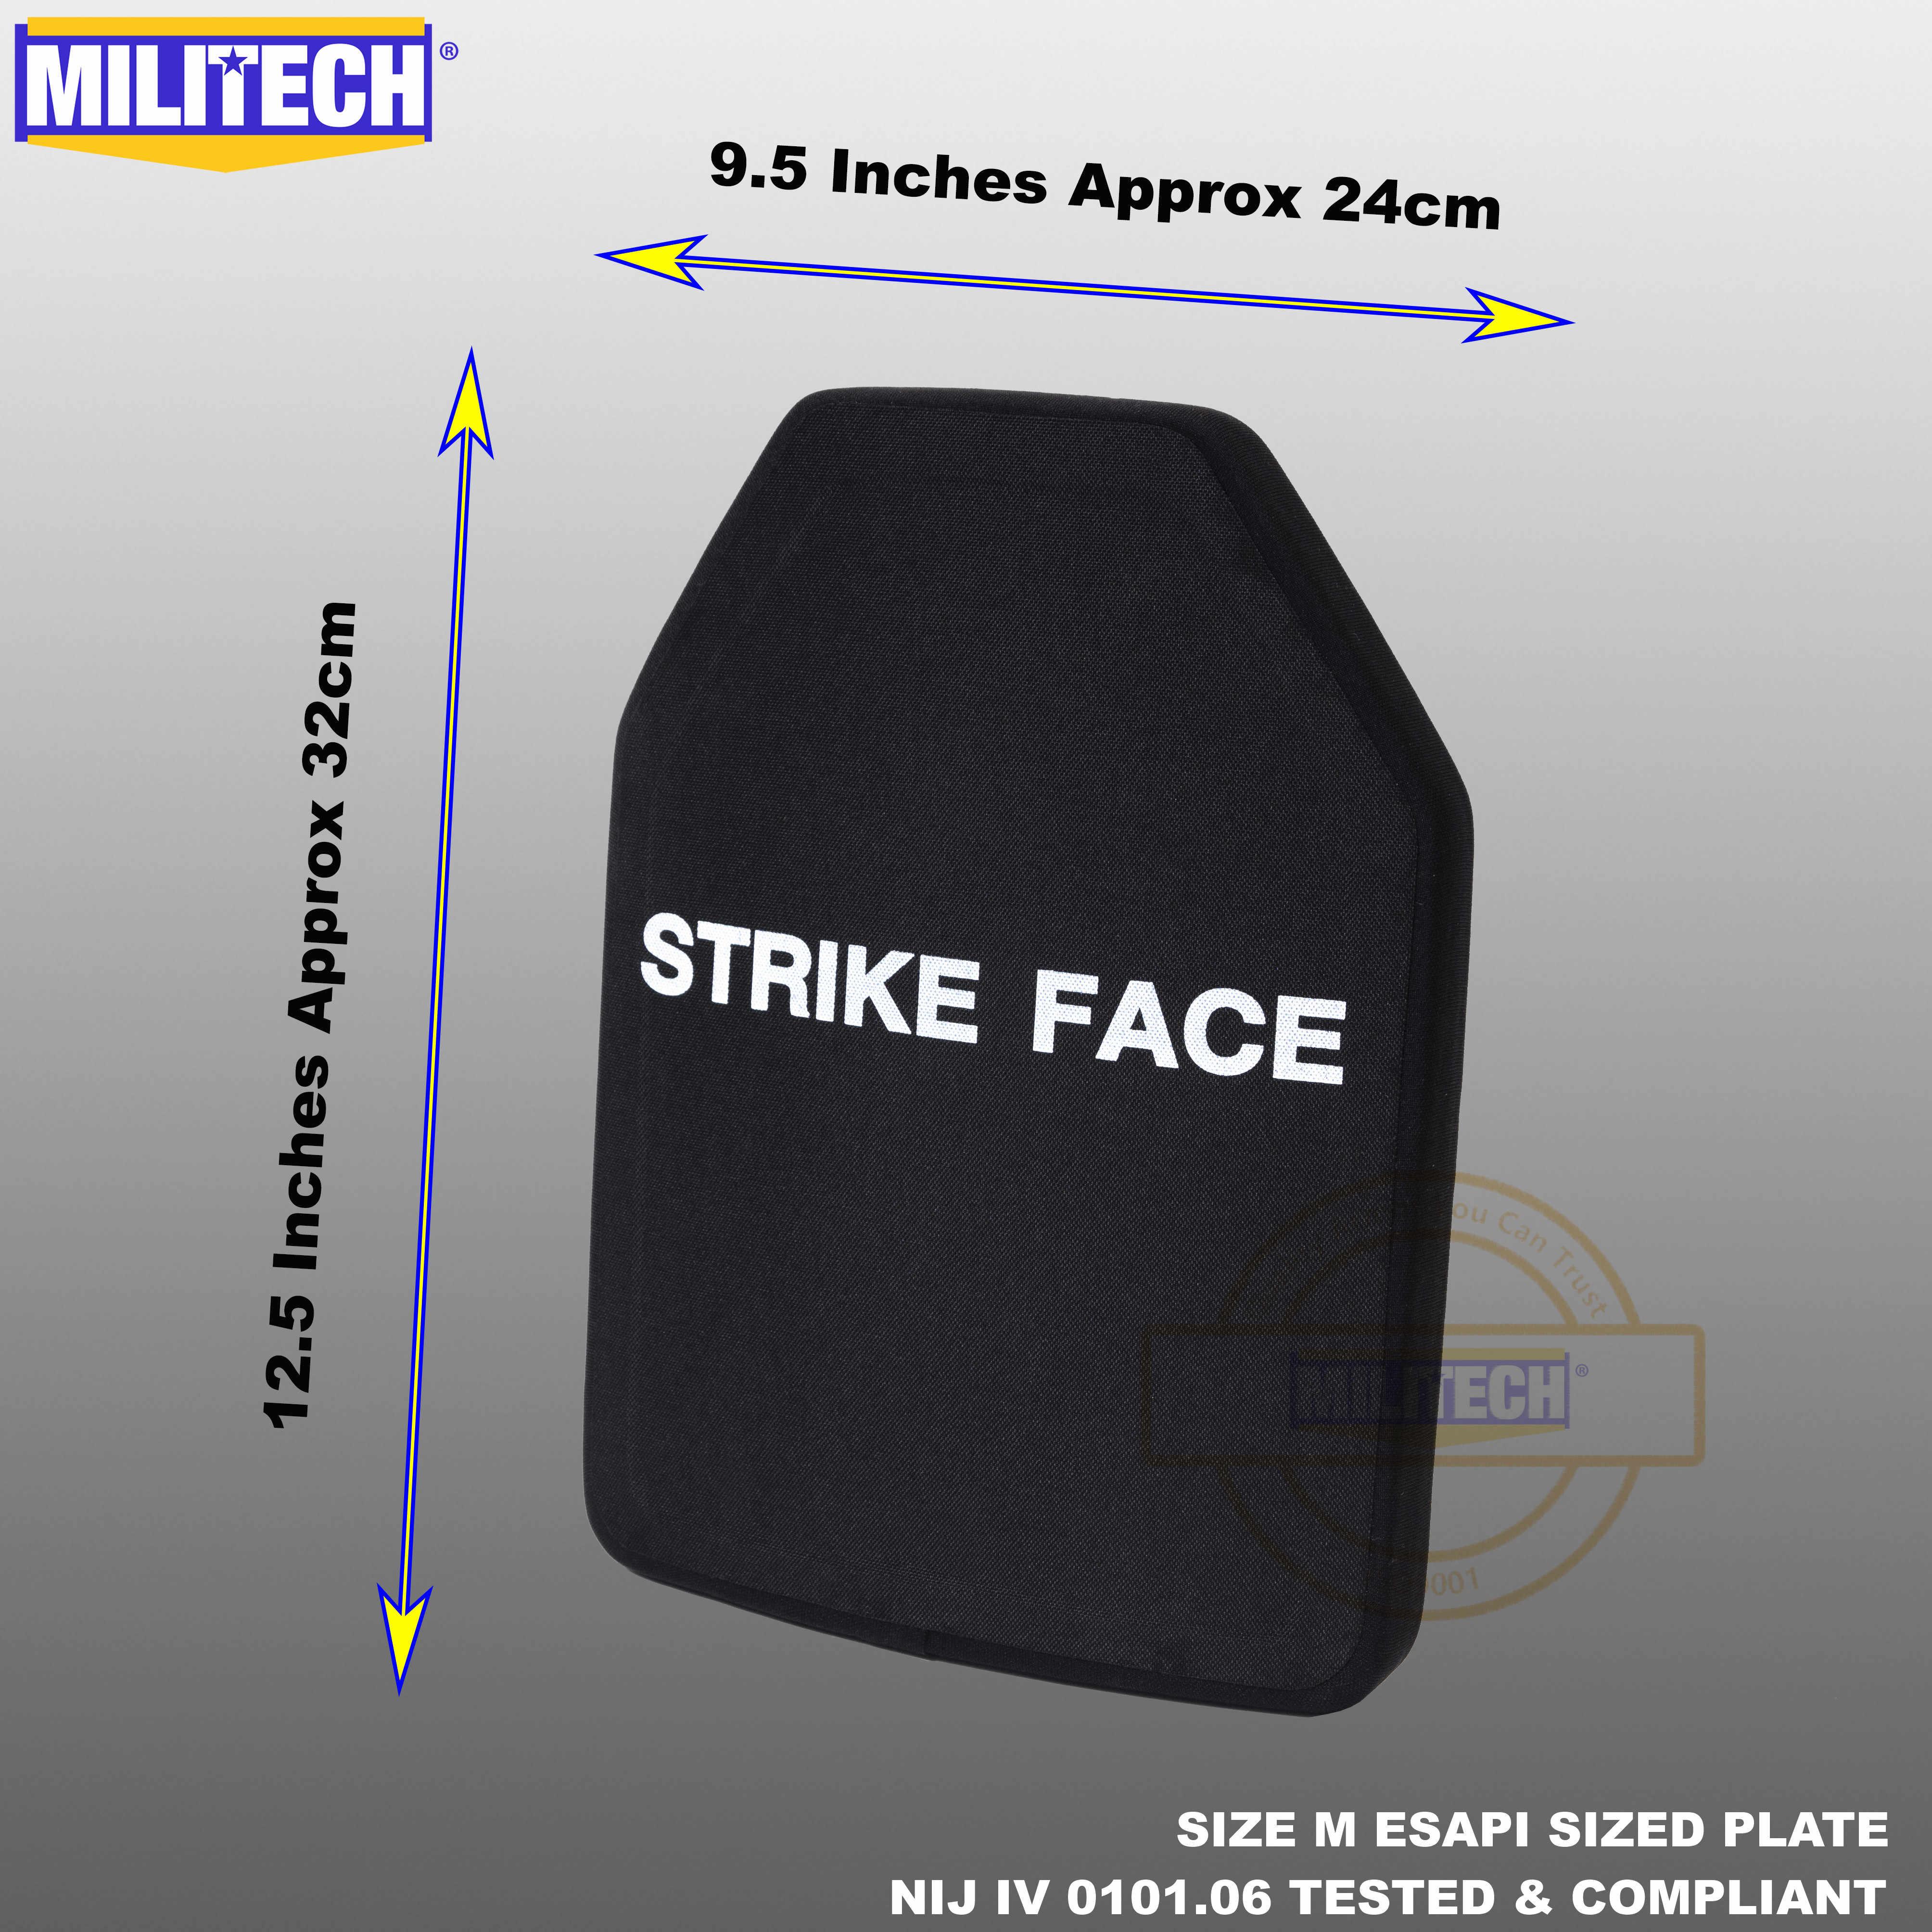 300 250 MUJING PE Bulletproof Board NIJ4 Dreistufige kugelsichere Verbundversion von China//Gewicht 2,7 kg 22 mm